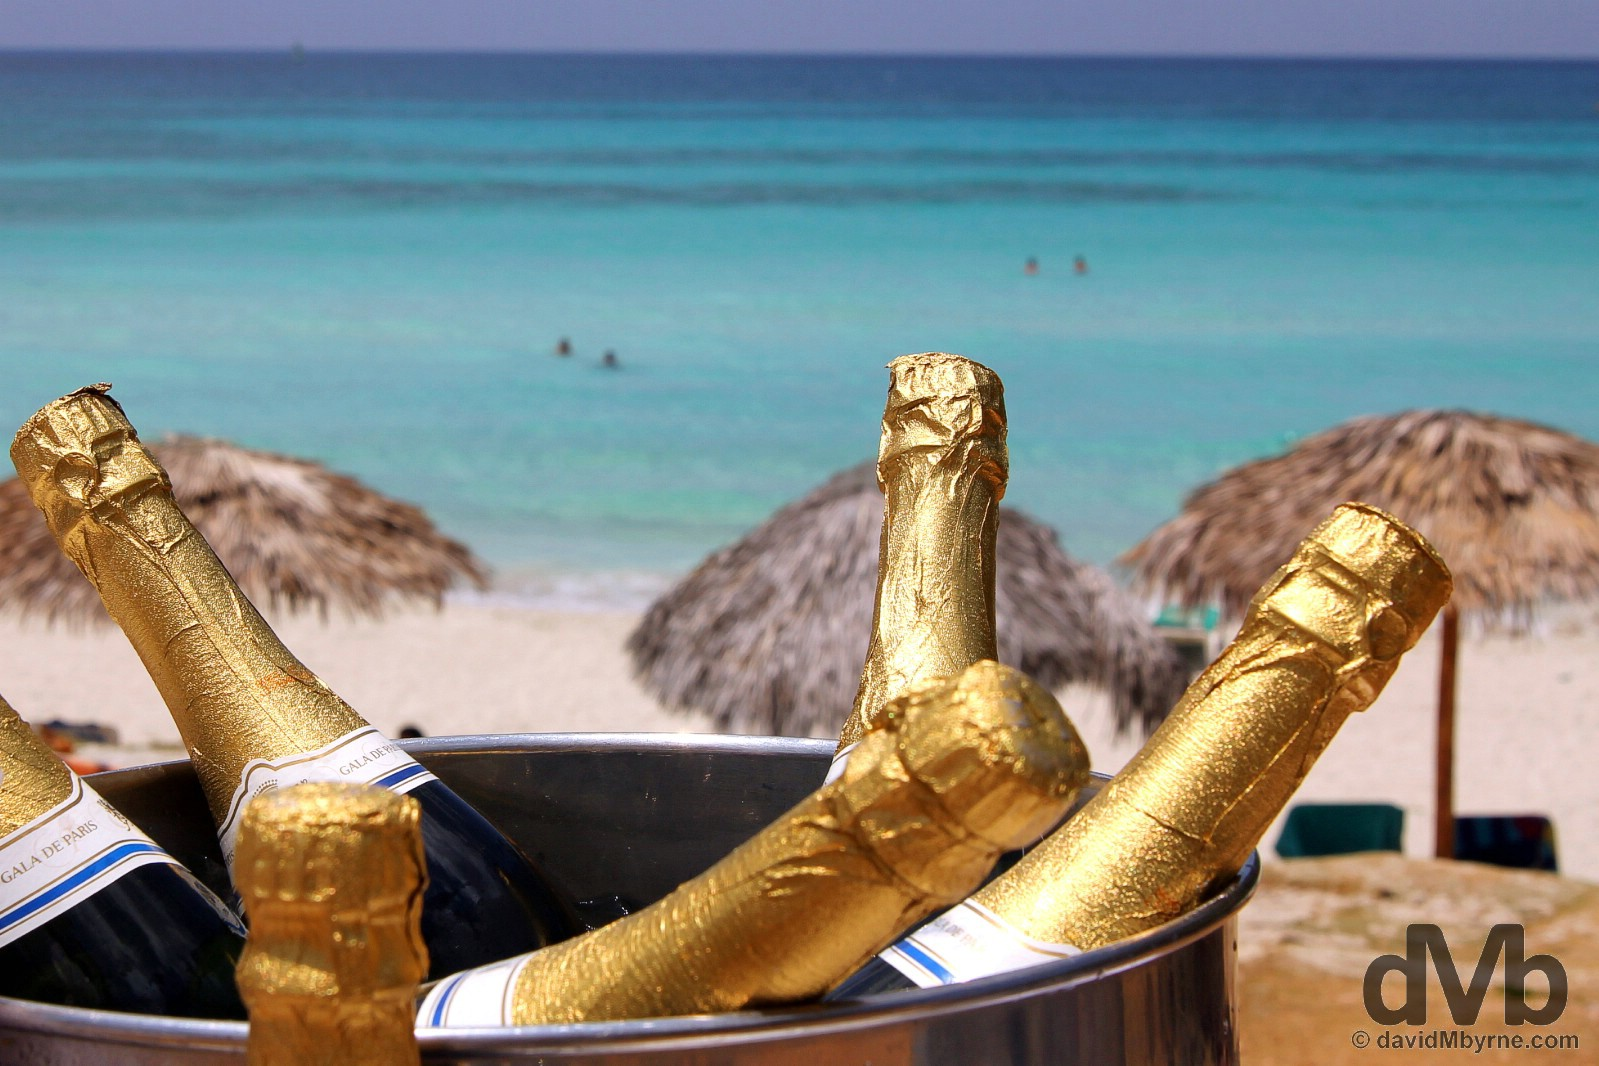 Chris & Liane's wedding. Breezes Bella Costa resort, Varadero, Cuba. April 27, 2015.